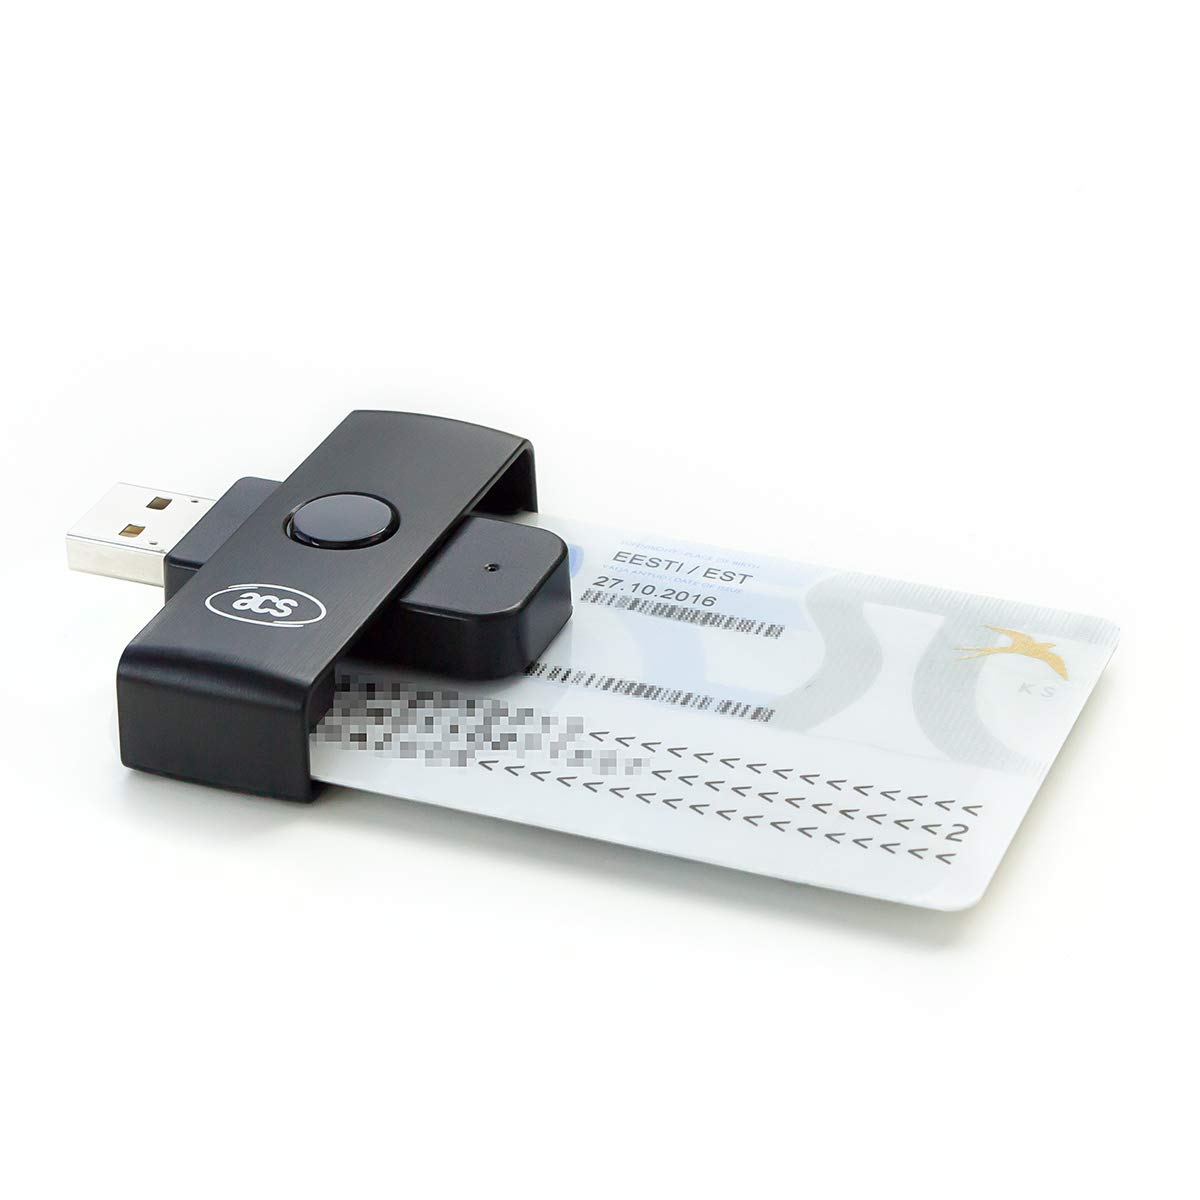 ACS ACR38U N1 PocketMate